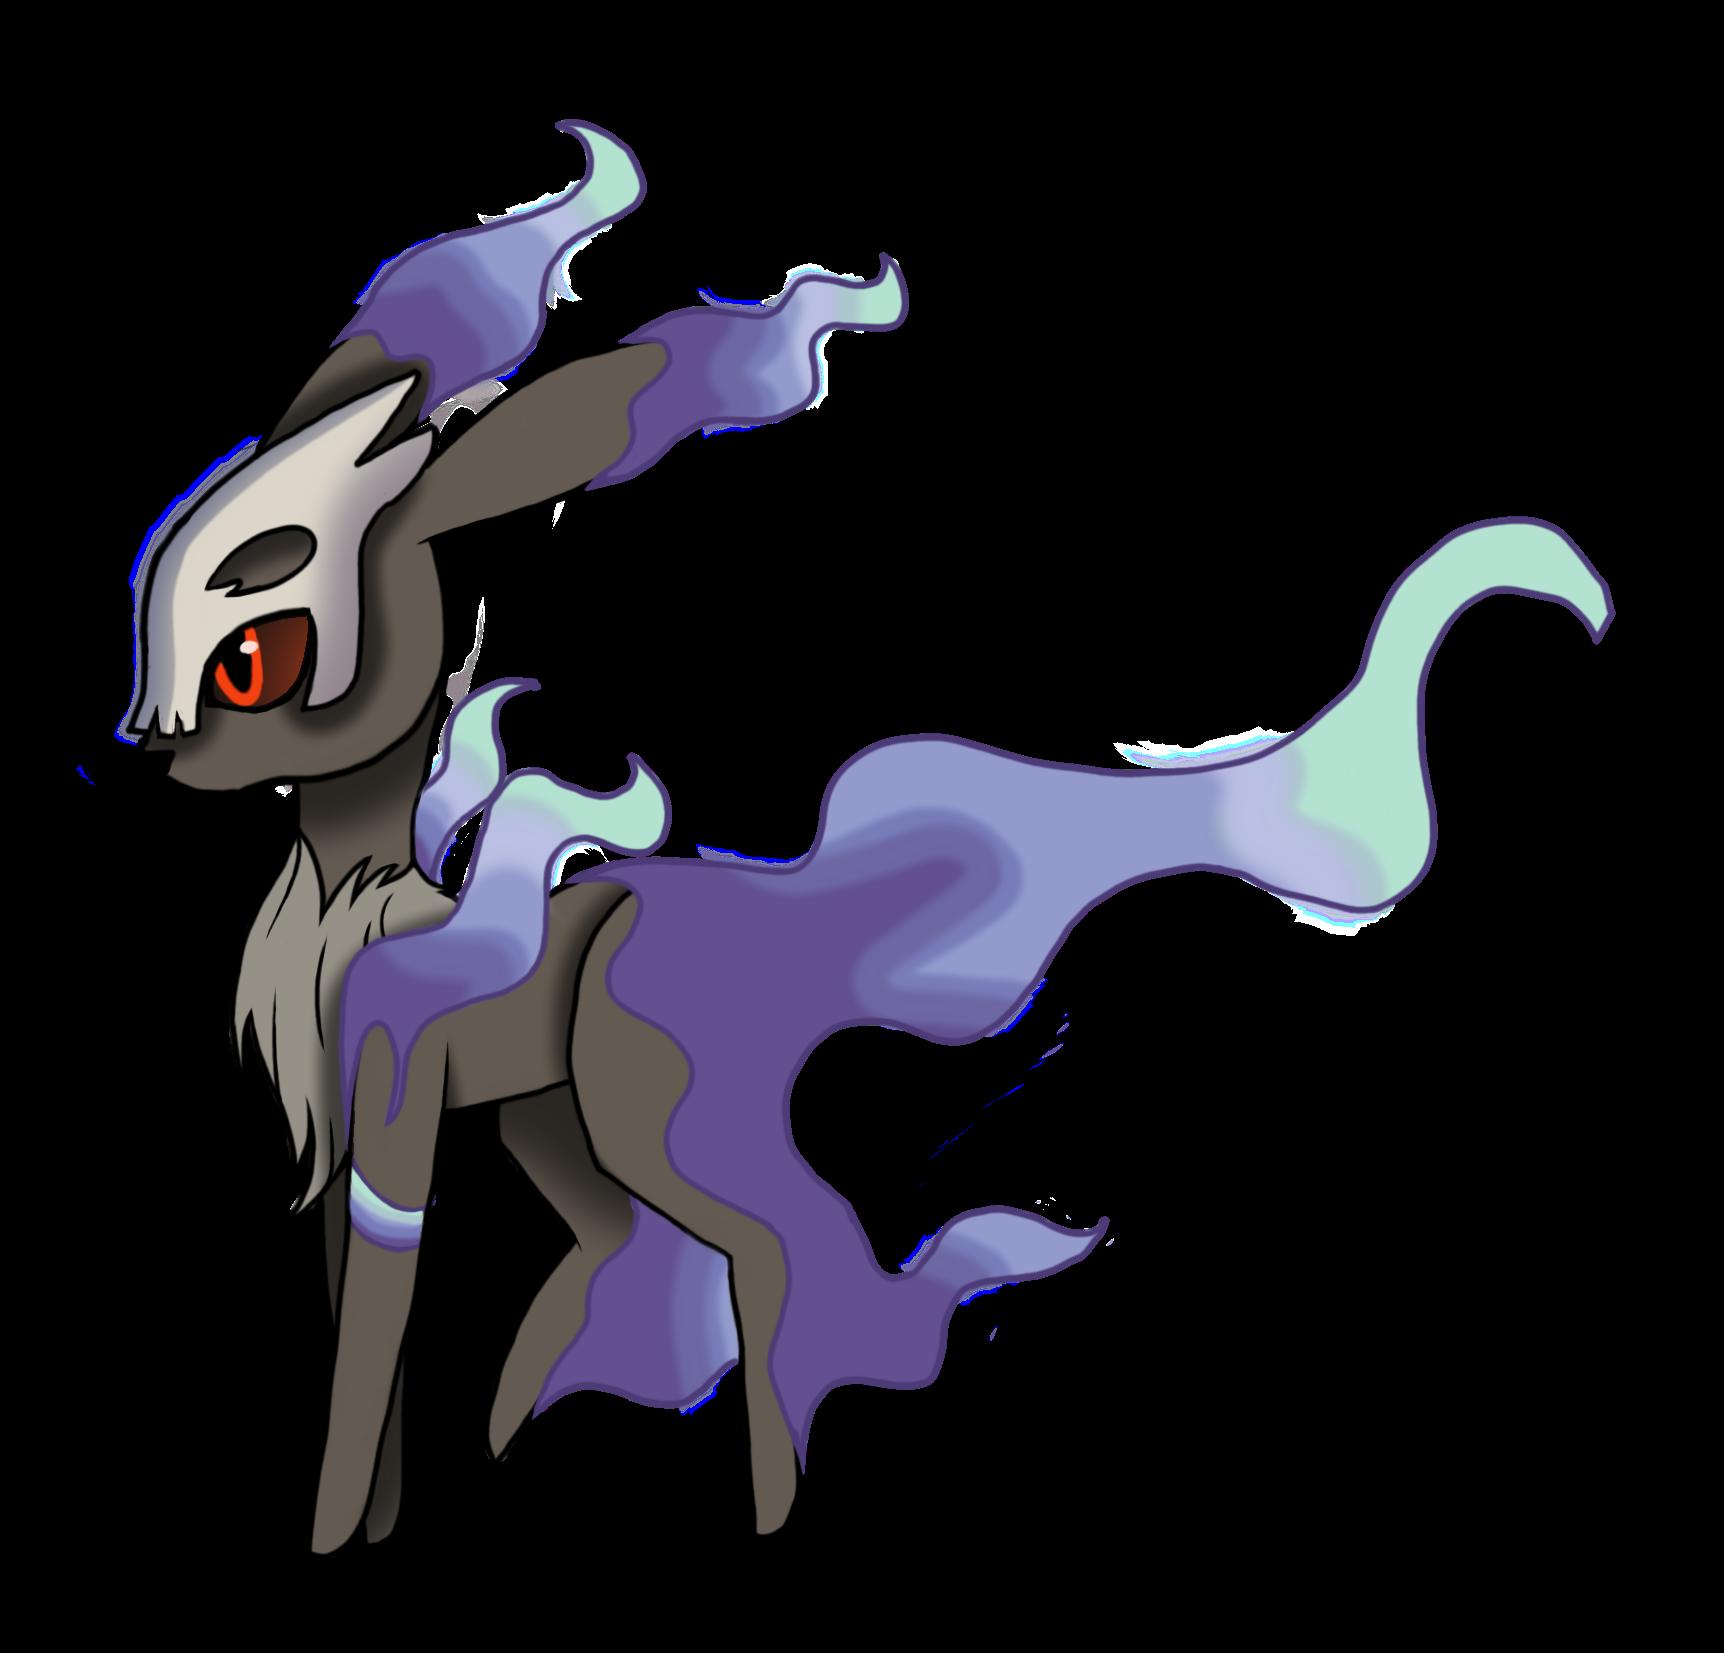 yokarimon ghost type eevee evolution, by madison hood